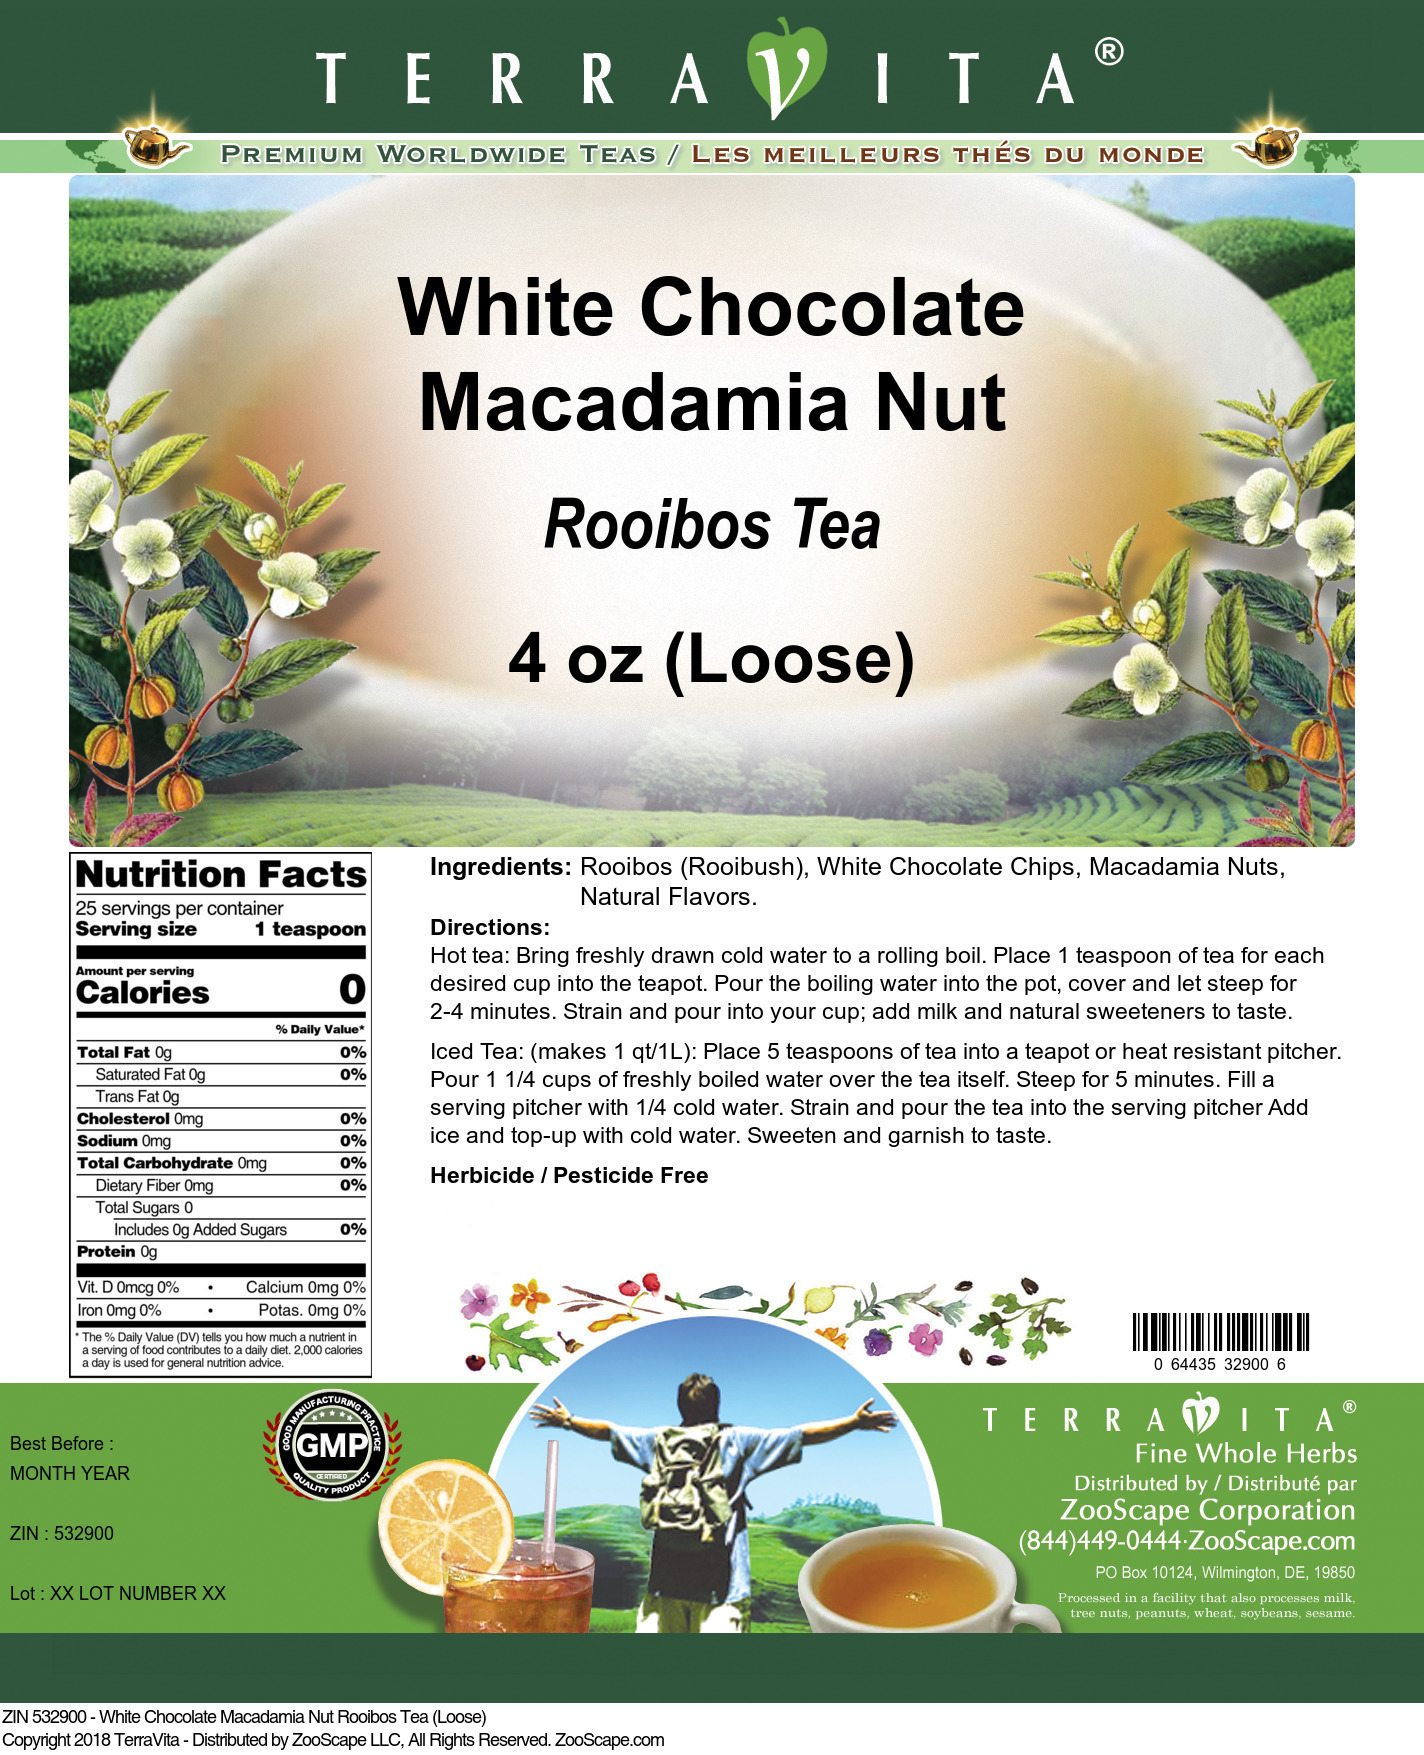 White Chocolate Macadamia Nut Rooibos Tea